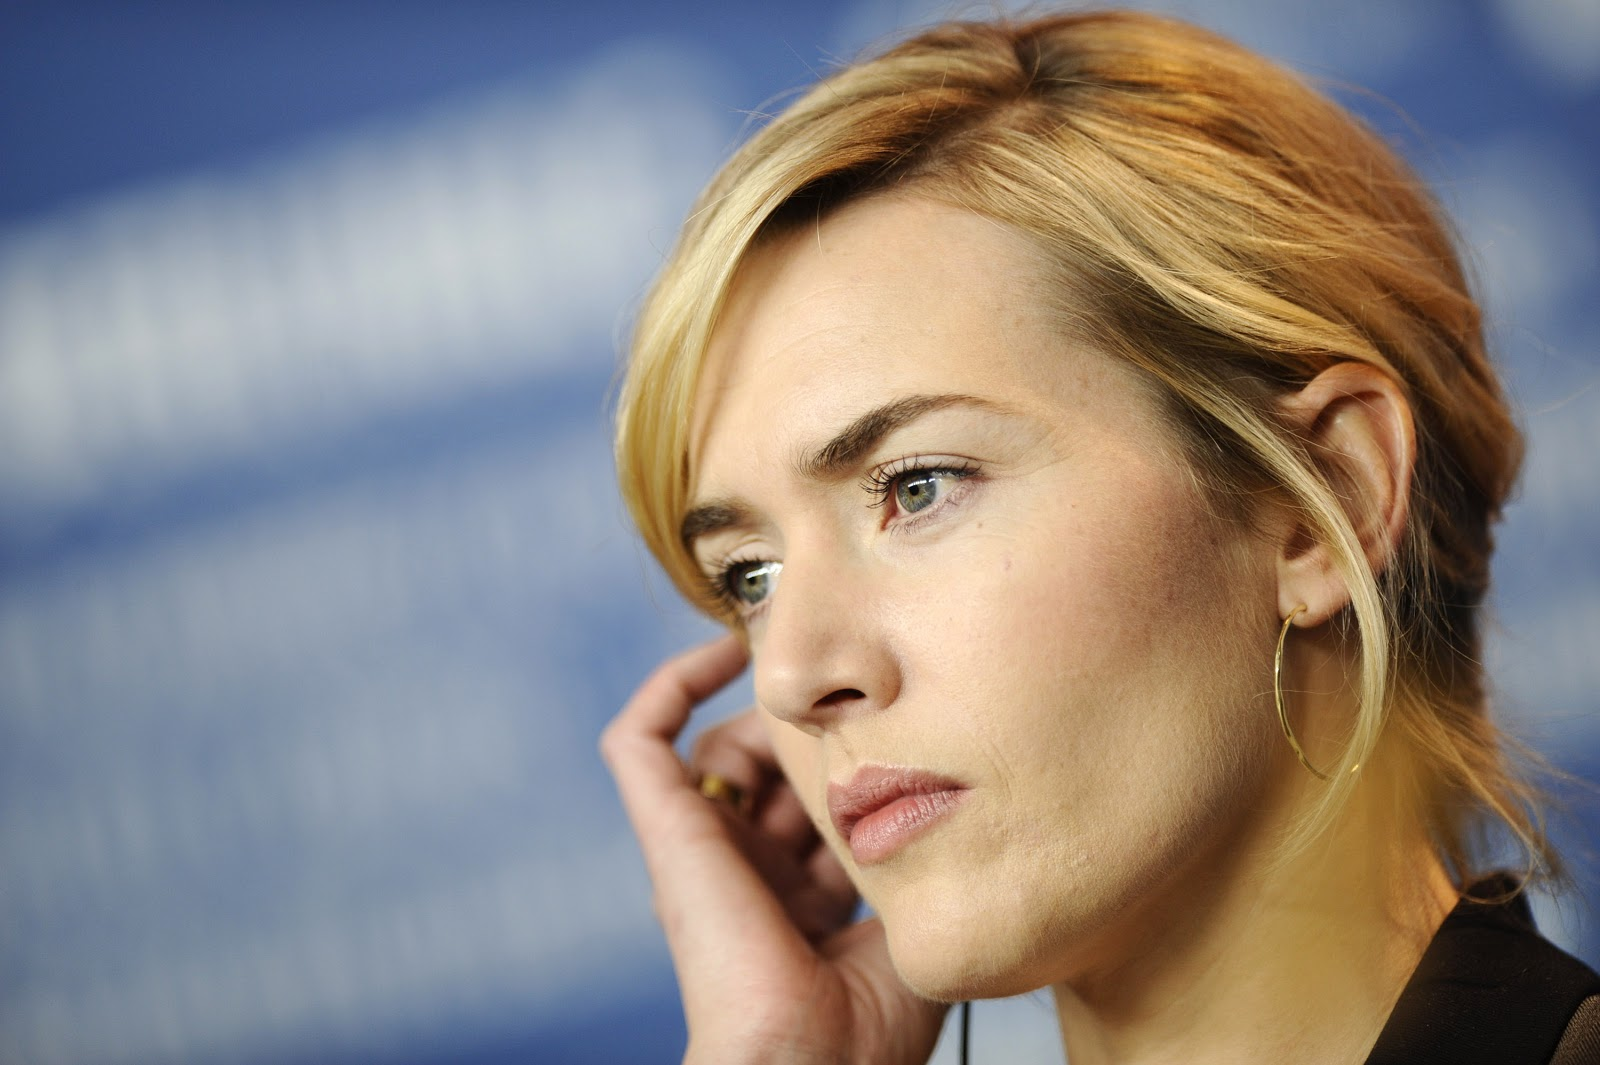 celebrity photos titanic actress kate winslet hd images – webenty